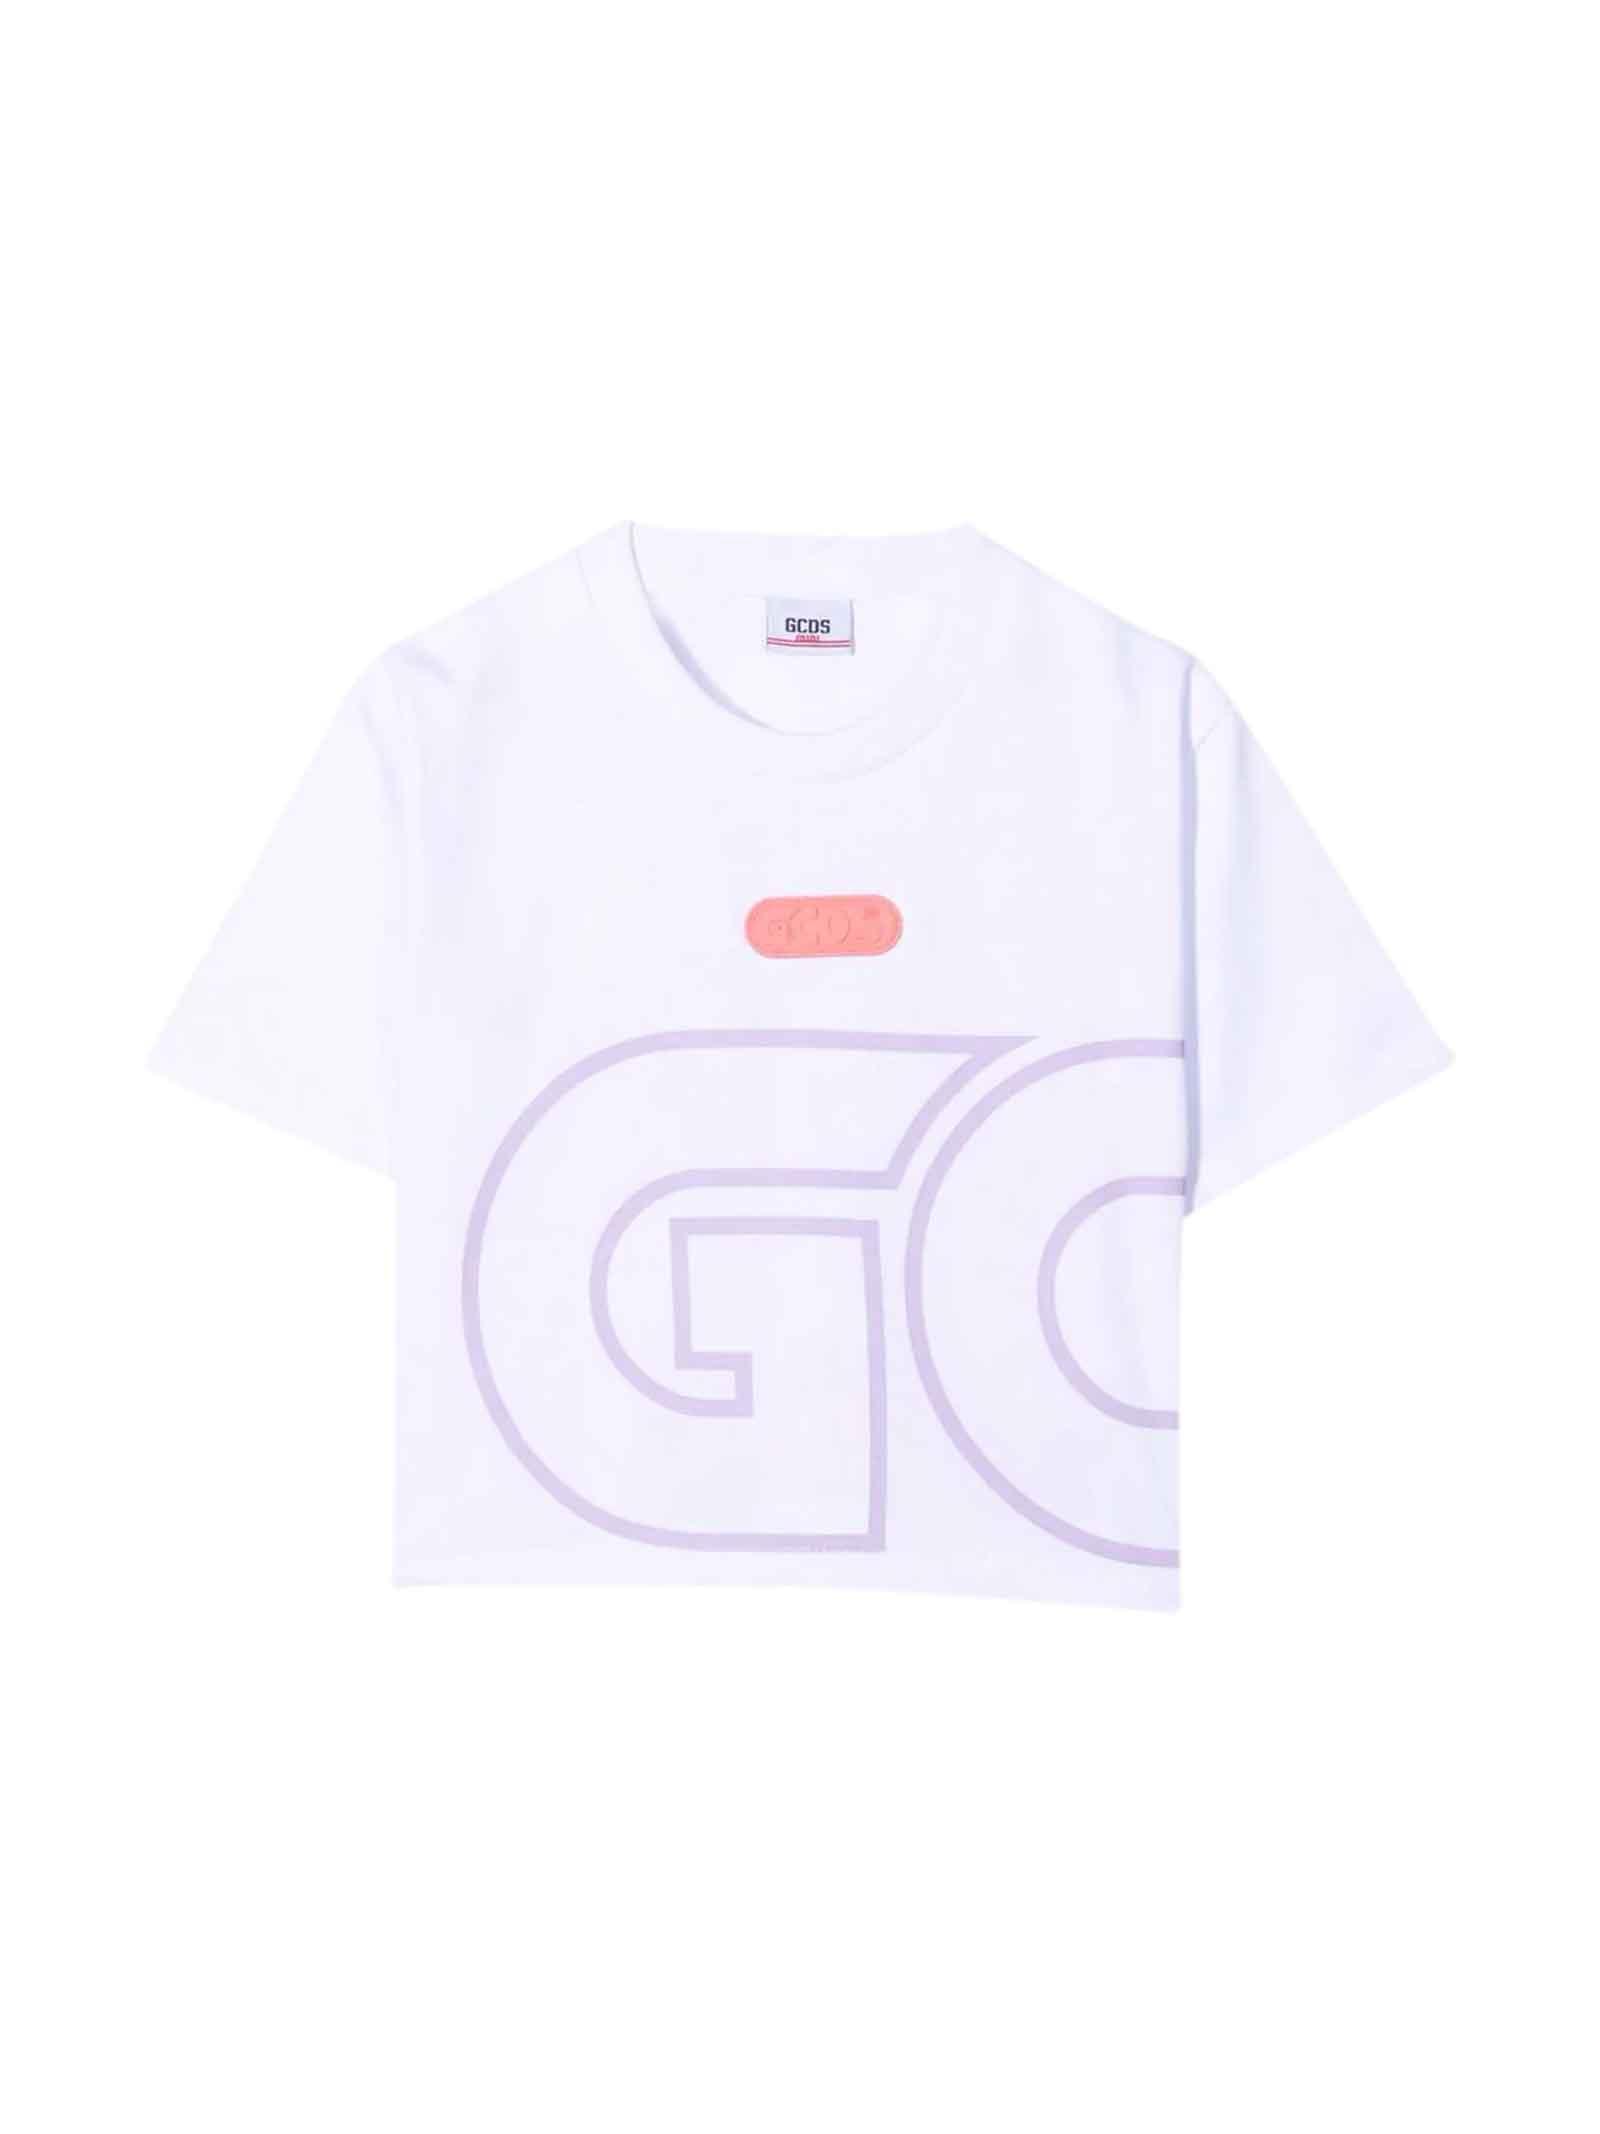 White Design Cropped T-shirt